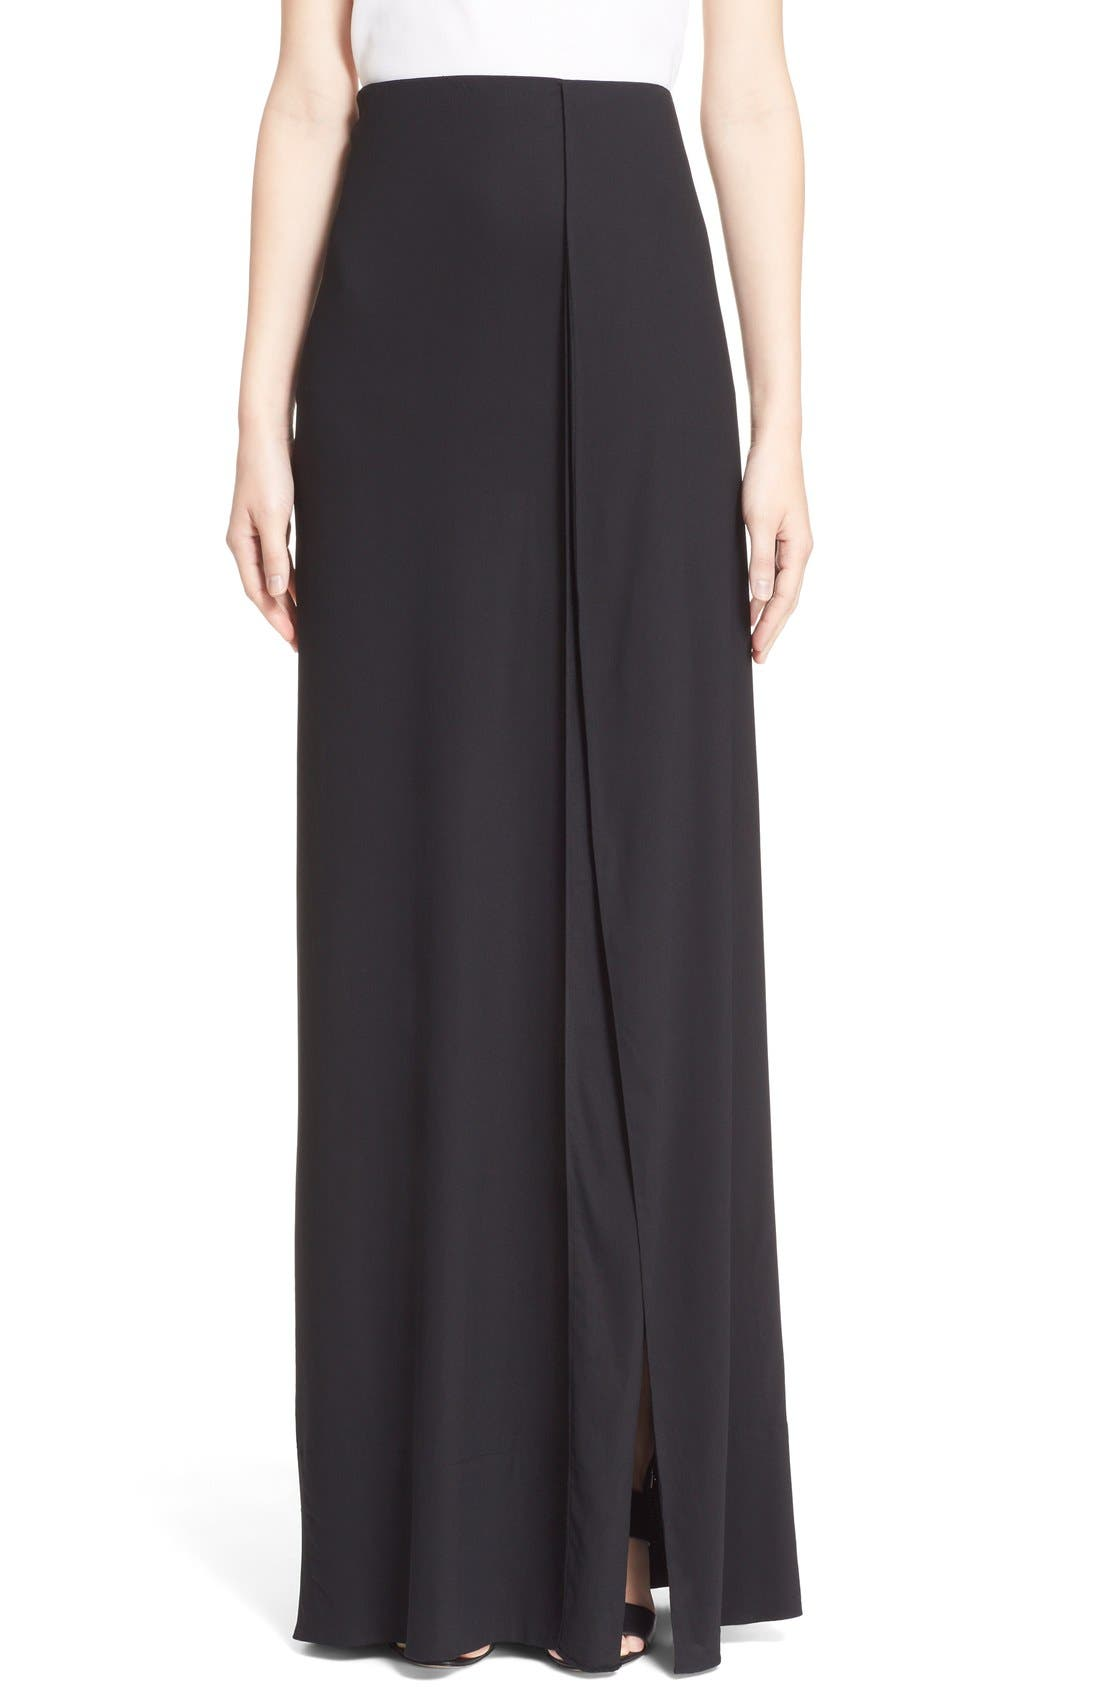 Main Image - Donna Karan New York Crepe Flutter Maxi Skirt